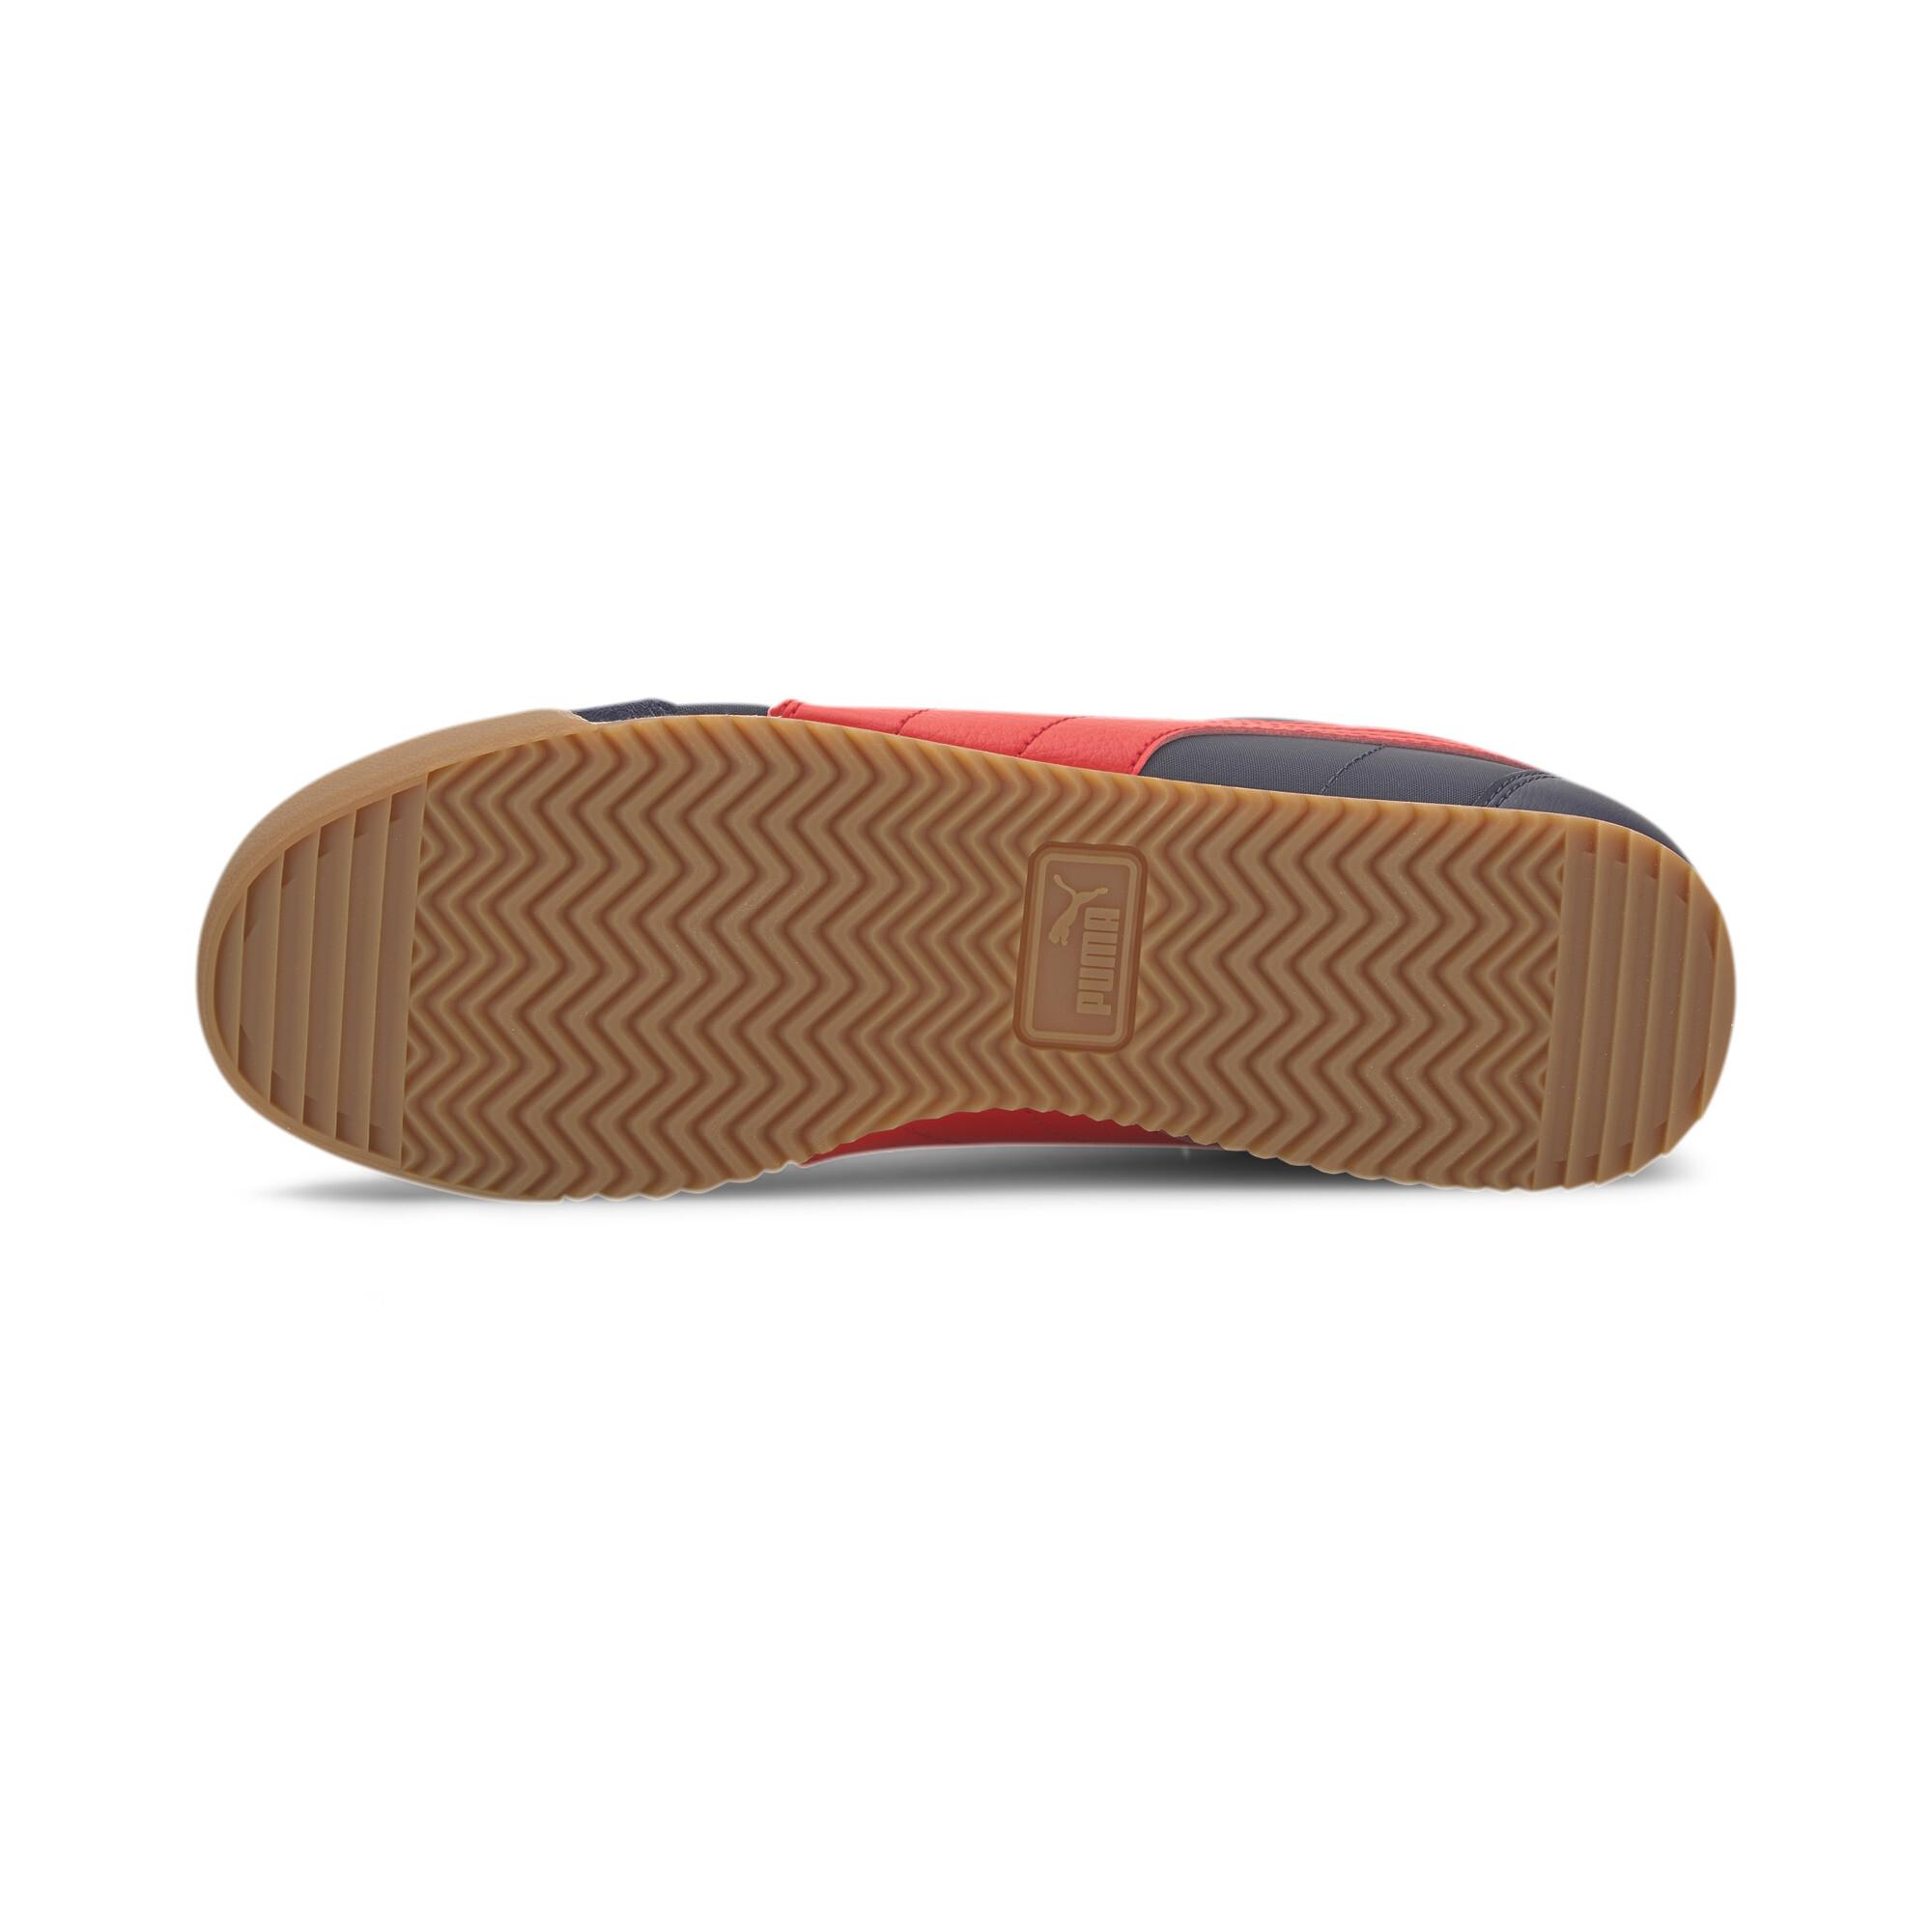 PUMA-Men-039-s-Turino-NL-Sneakers thumbnail 13